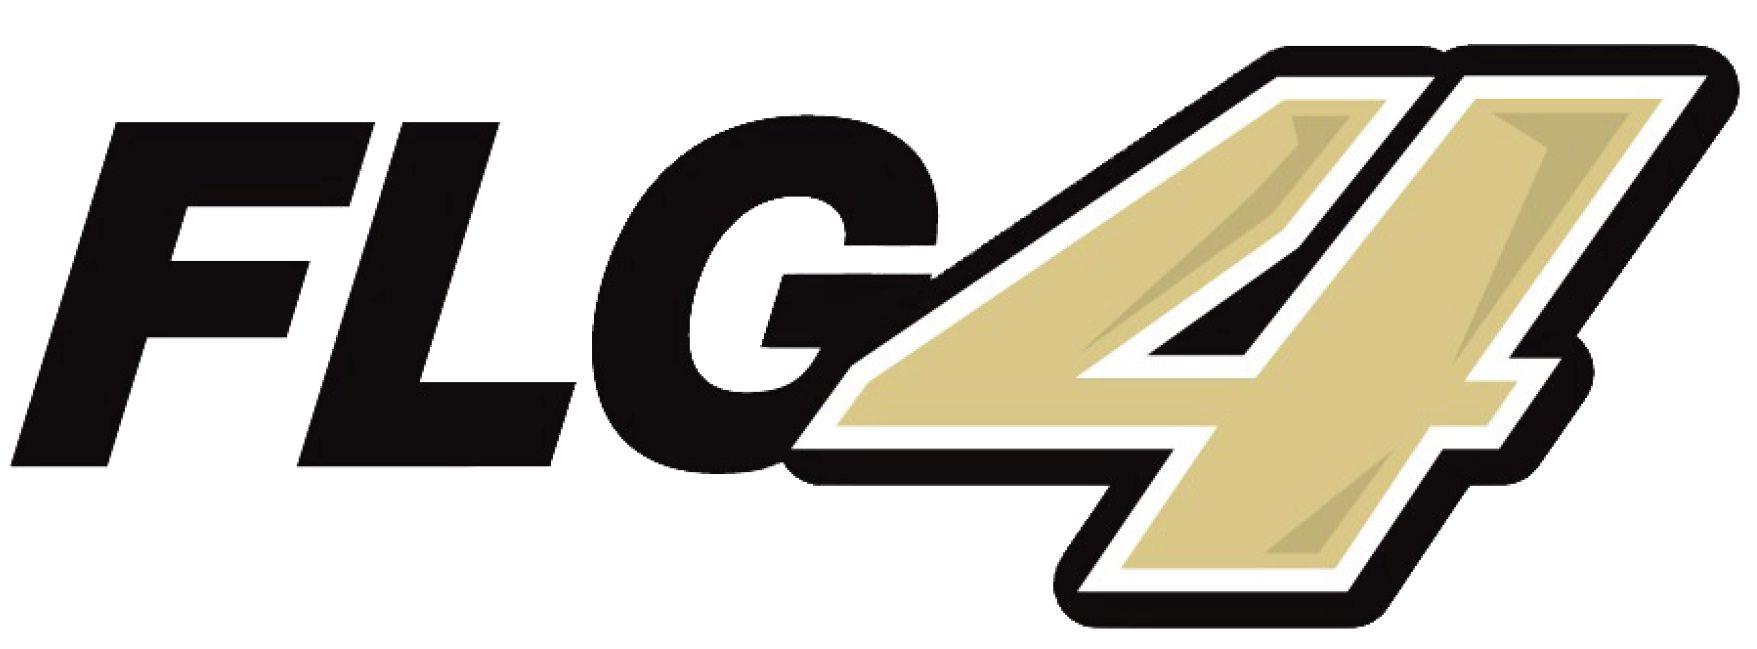 FLG 4